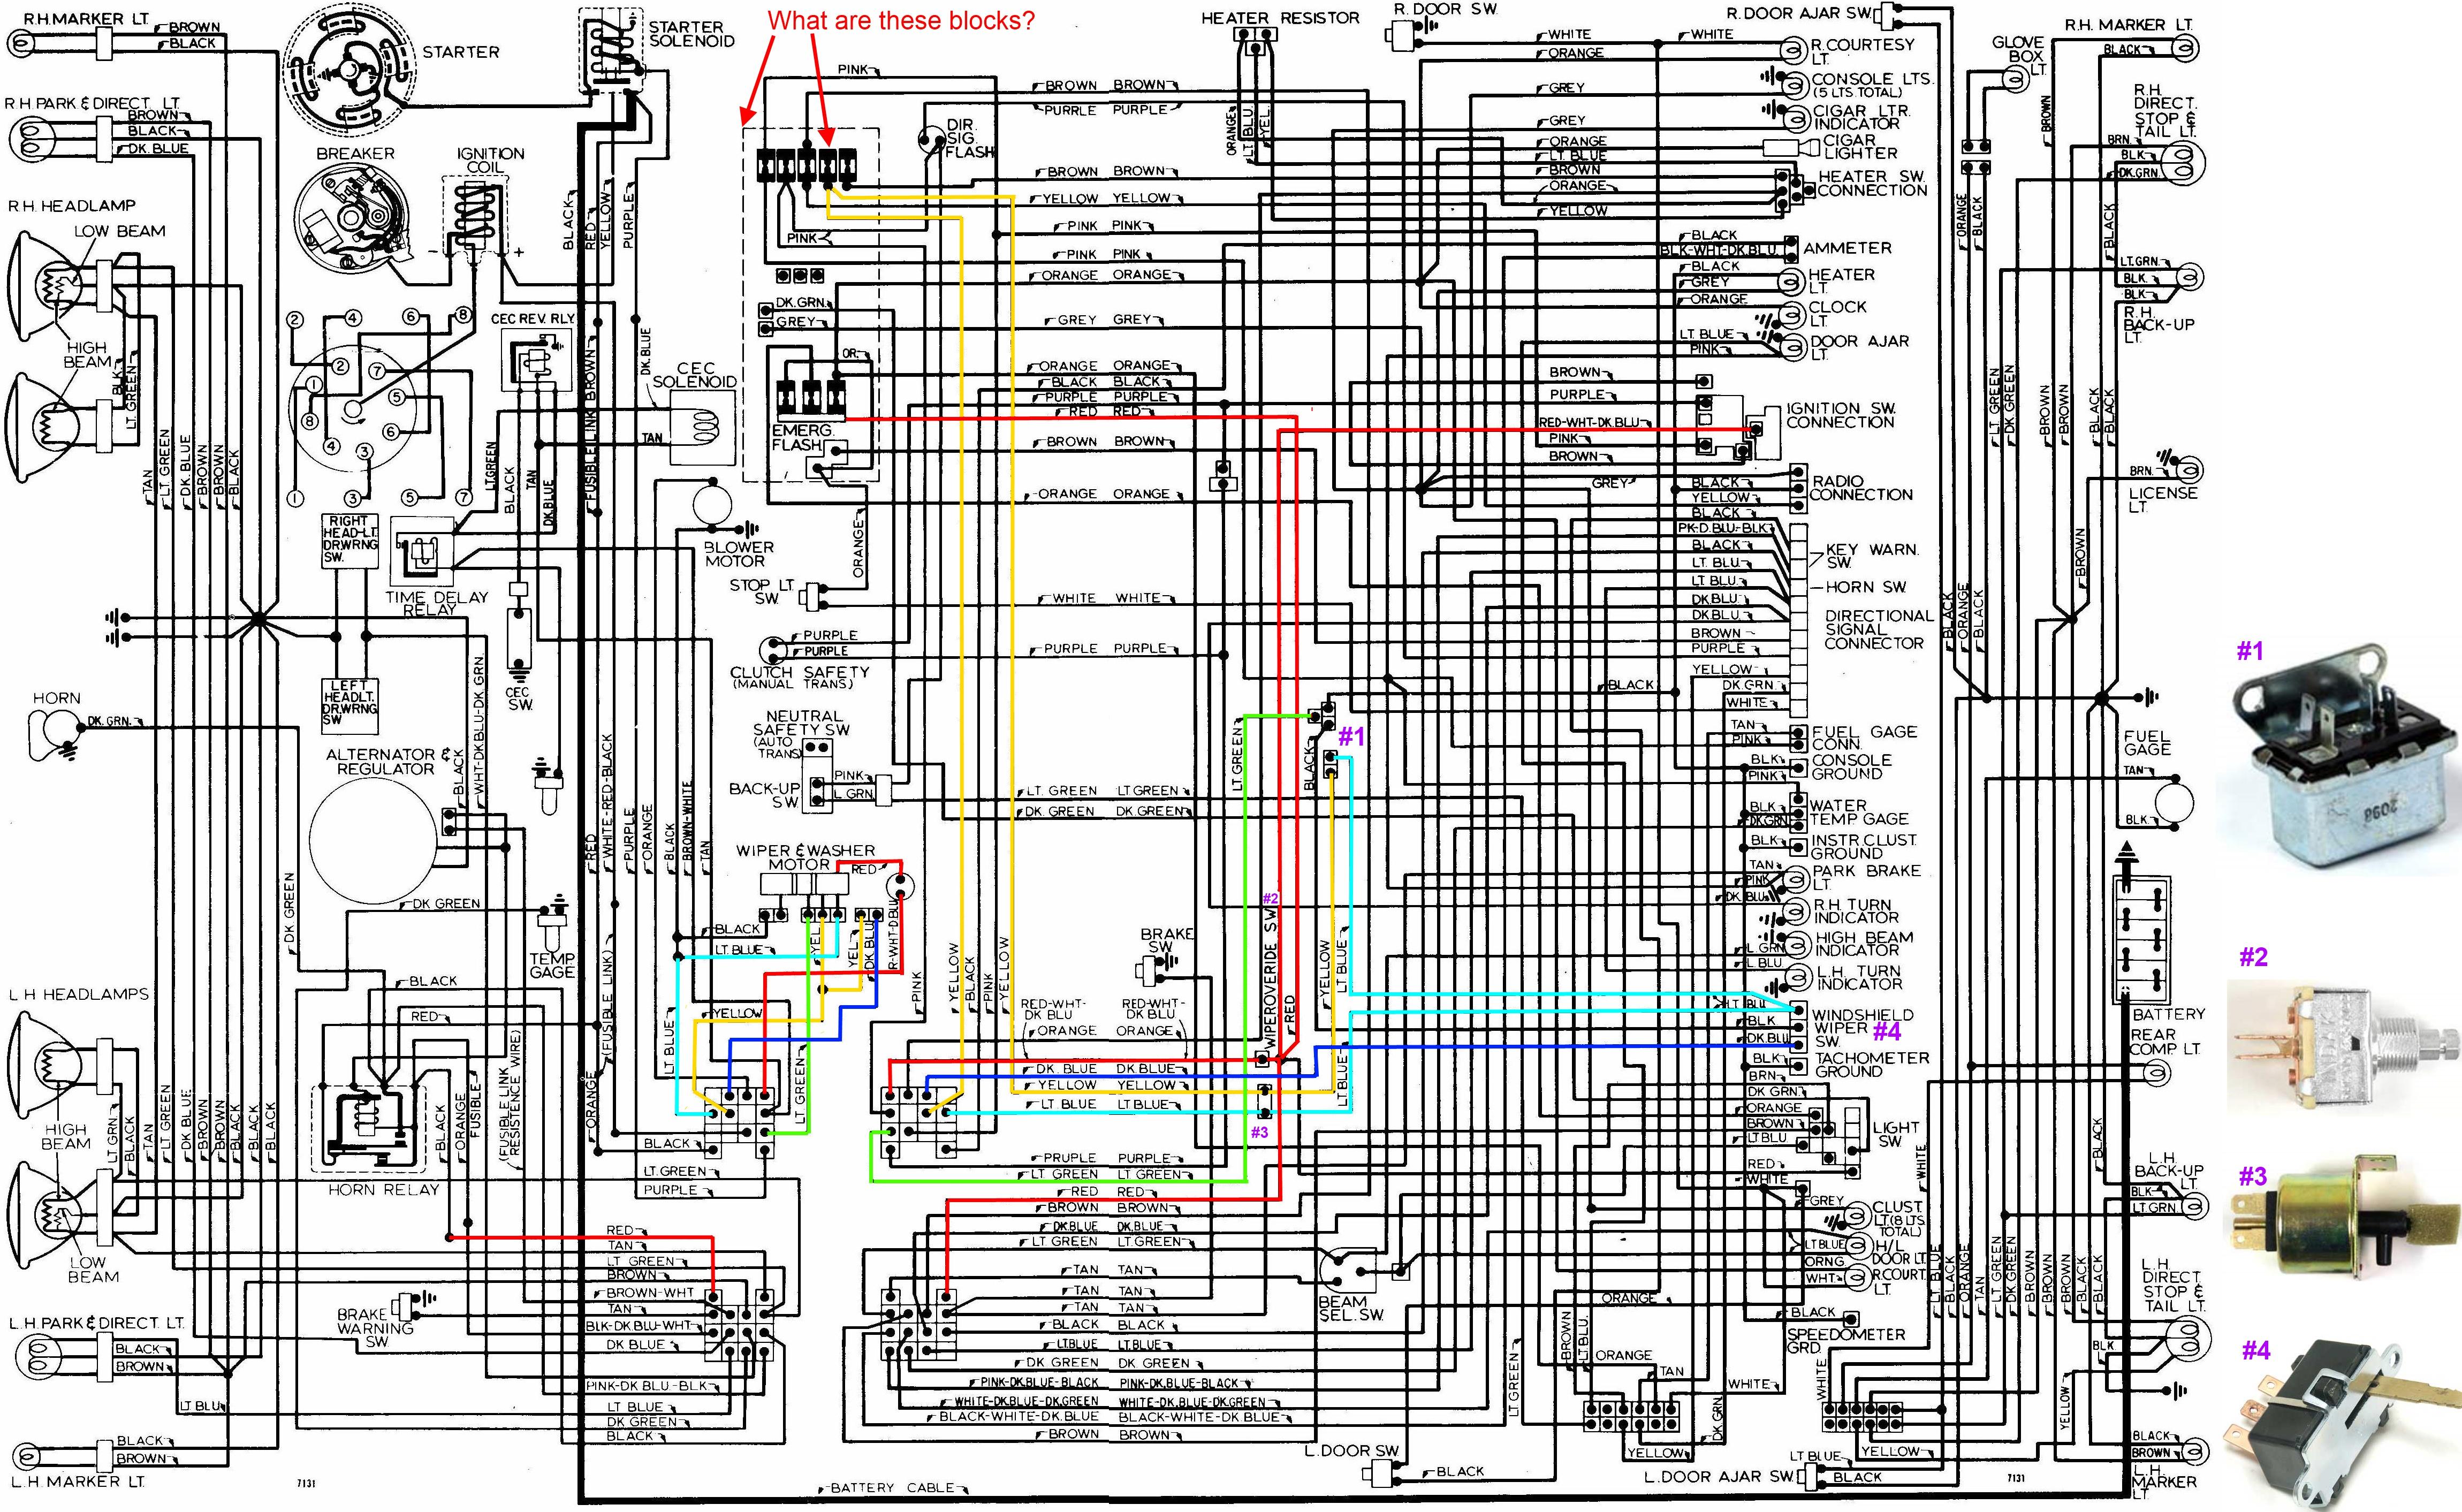 Awesome John Deere Z225 Wiring Flhx Turn Signal Wire Diagram 1956 ...